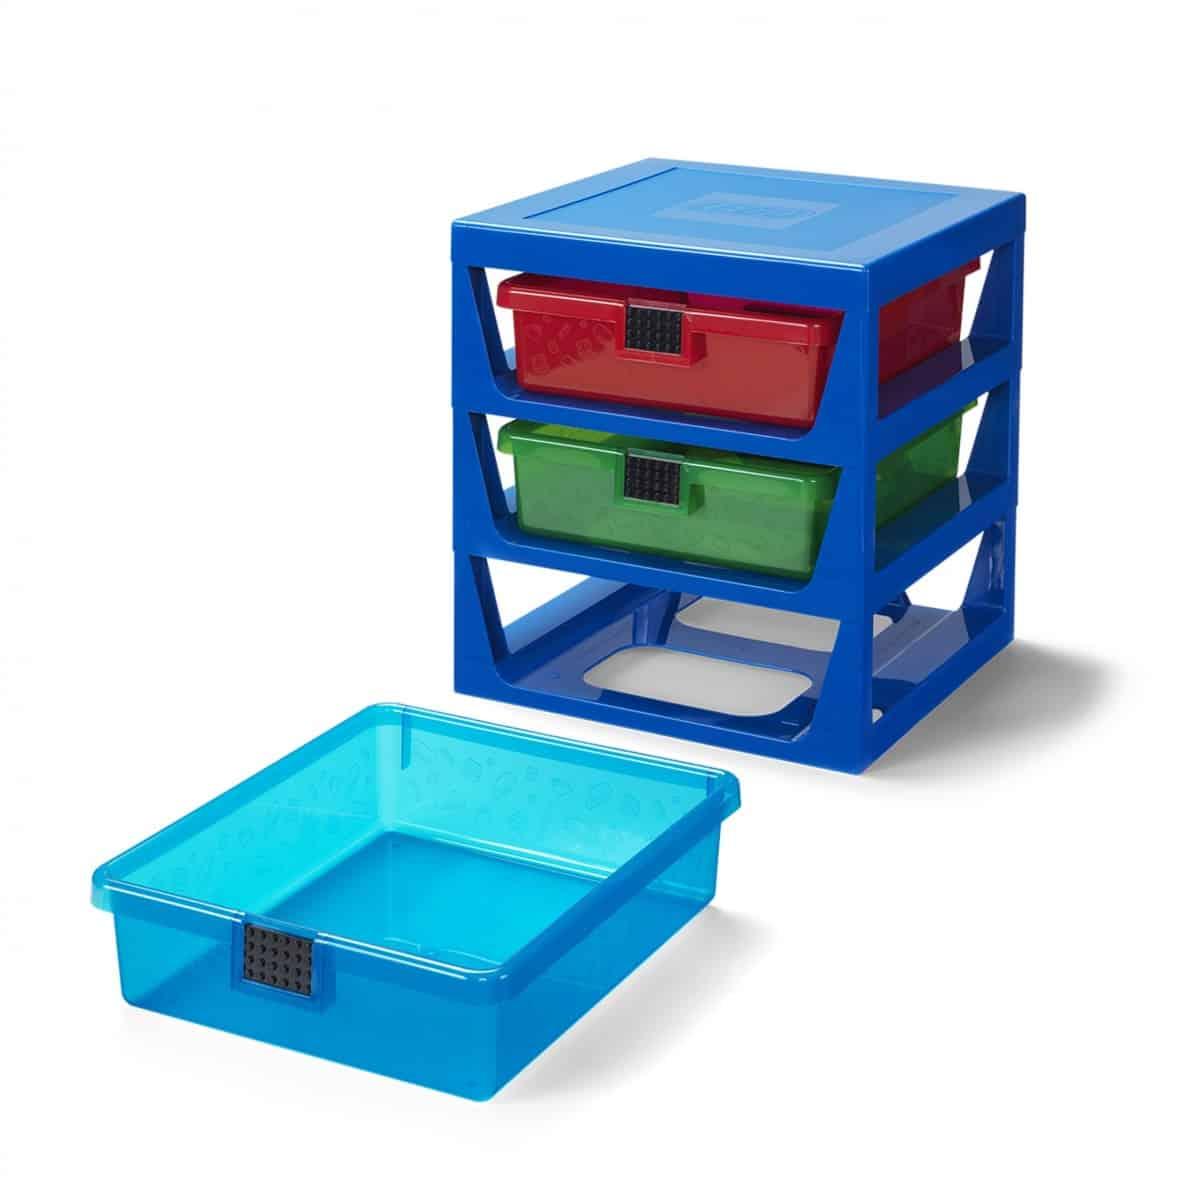 cajonera transparente en bastidor azul lego 5006179 scaled